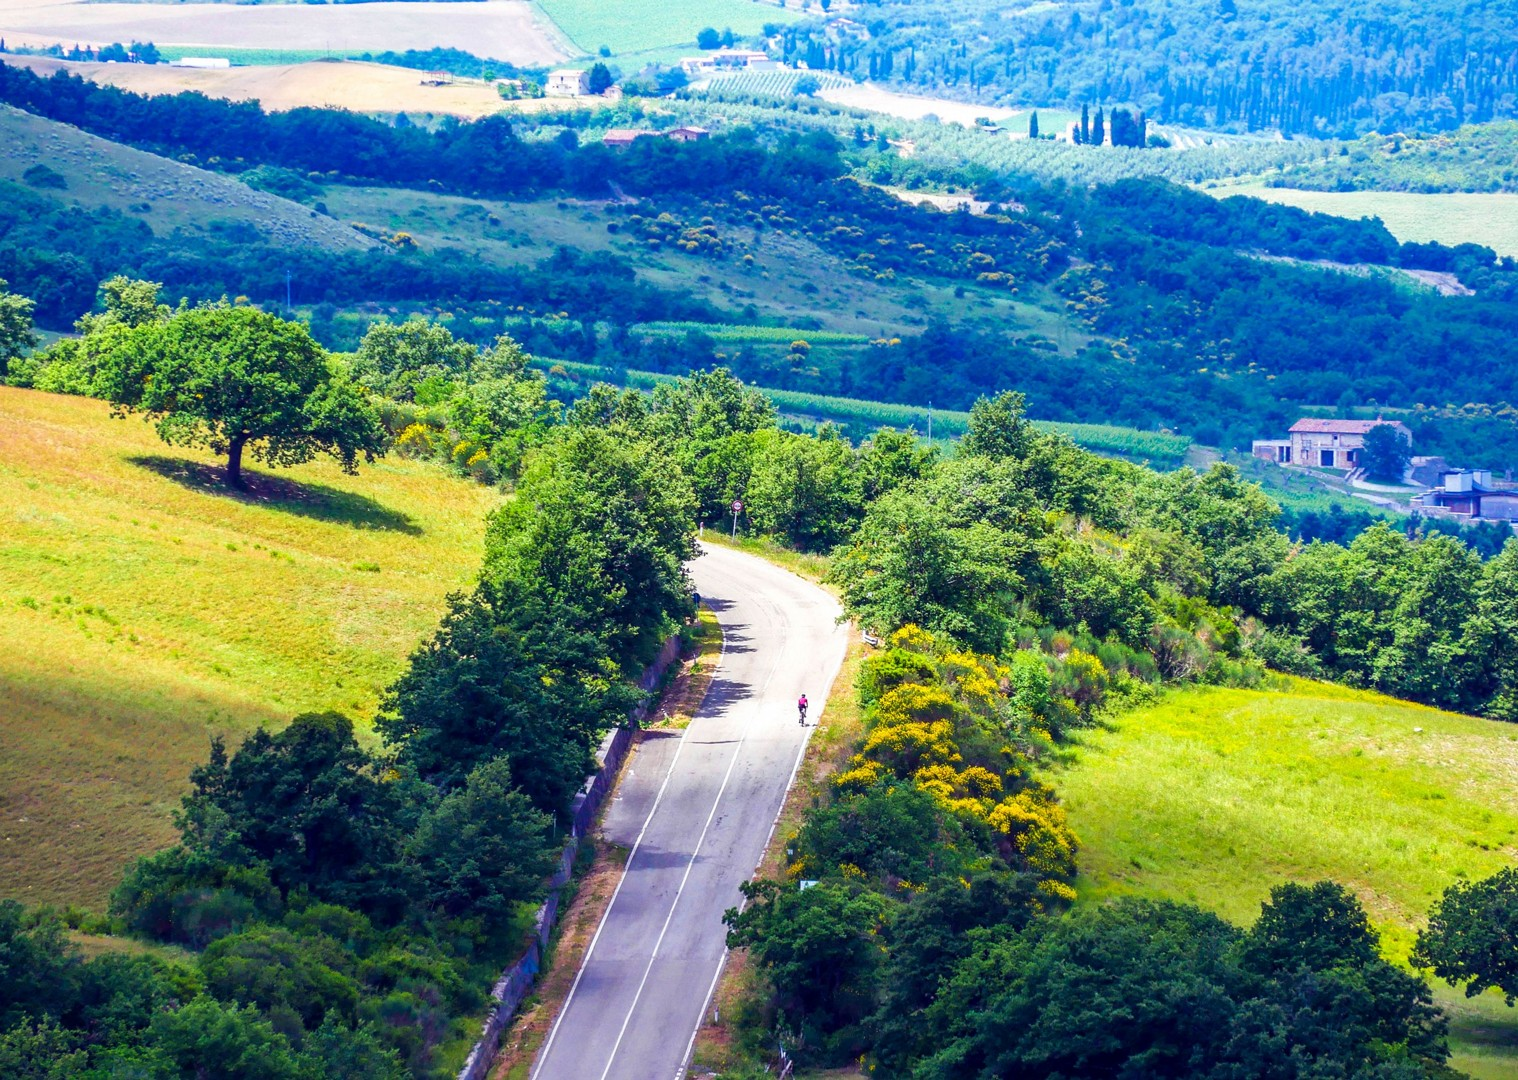 Solo.jpg - Italy - Tuscany - Giro della Toscana - Guided Road Cycling Holiday - Road Cycling